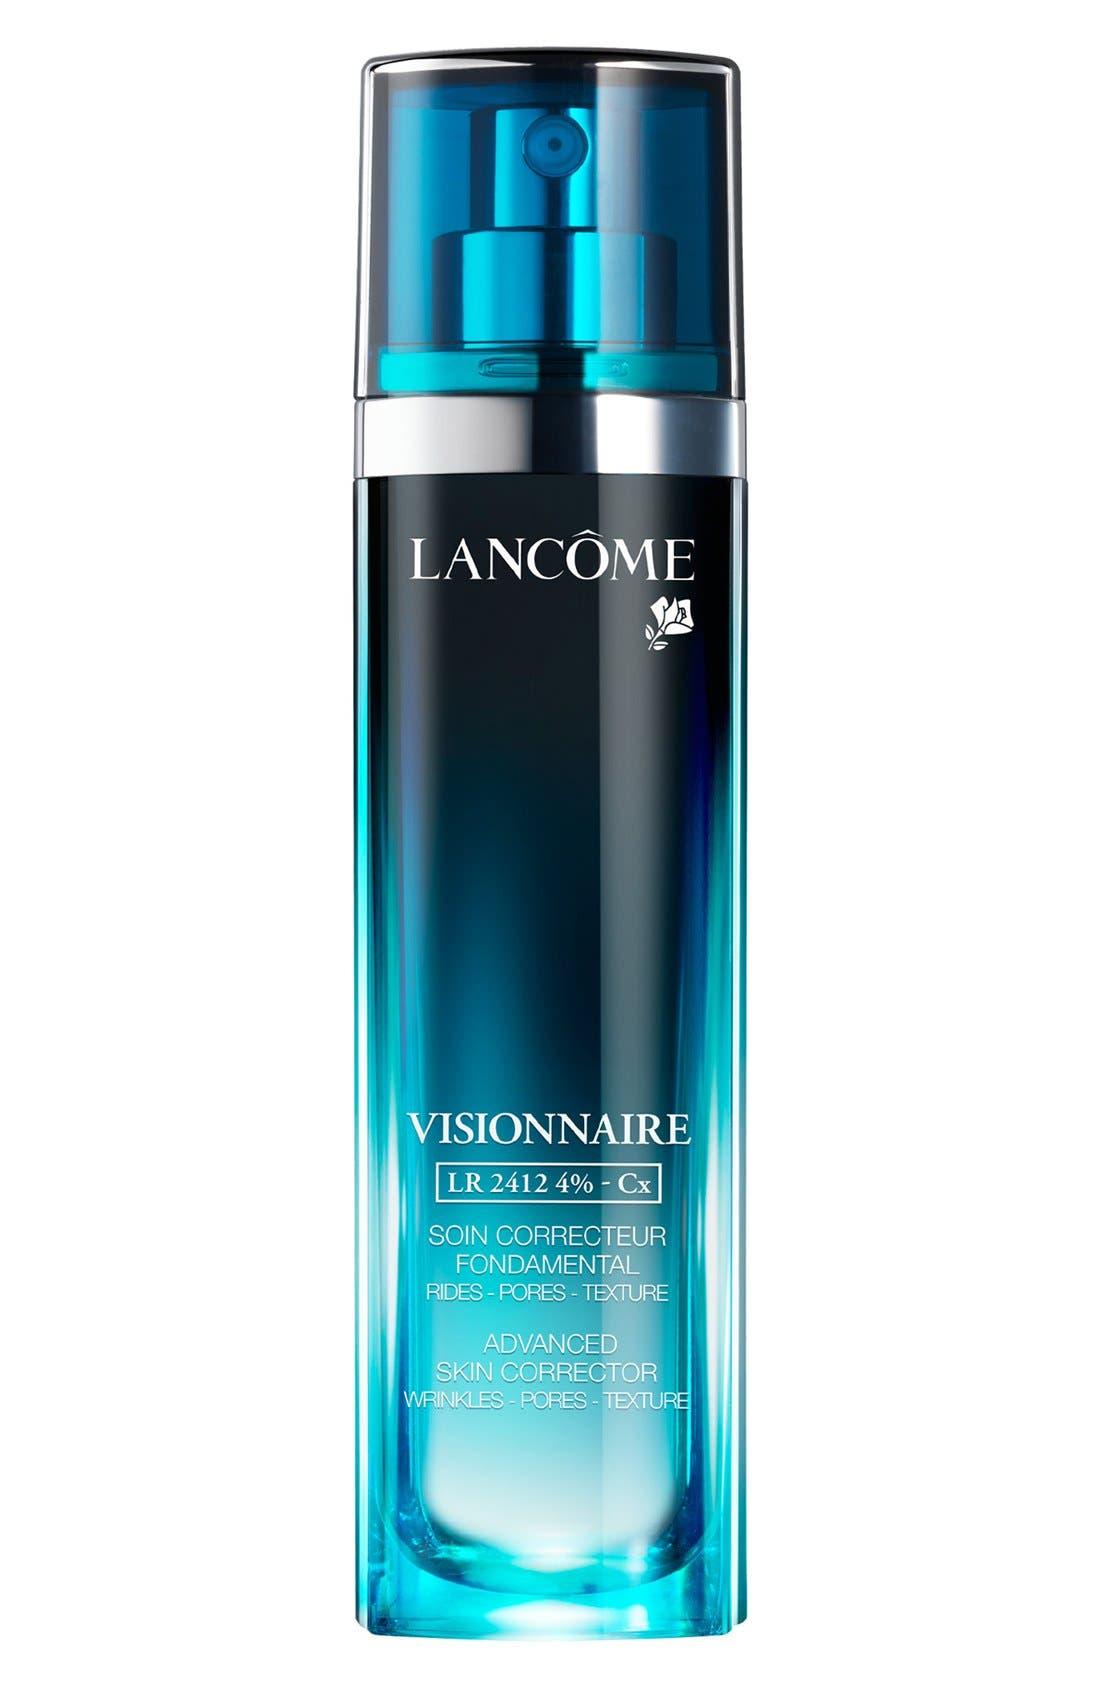 Visionnaire Lancôme